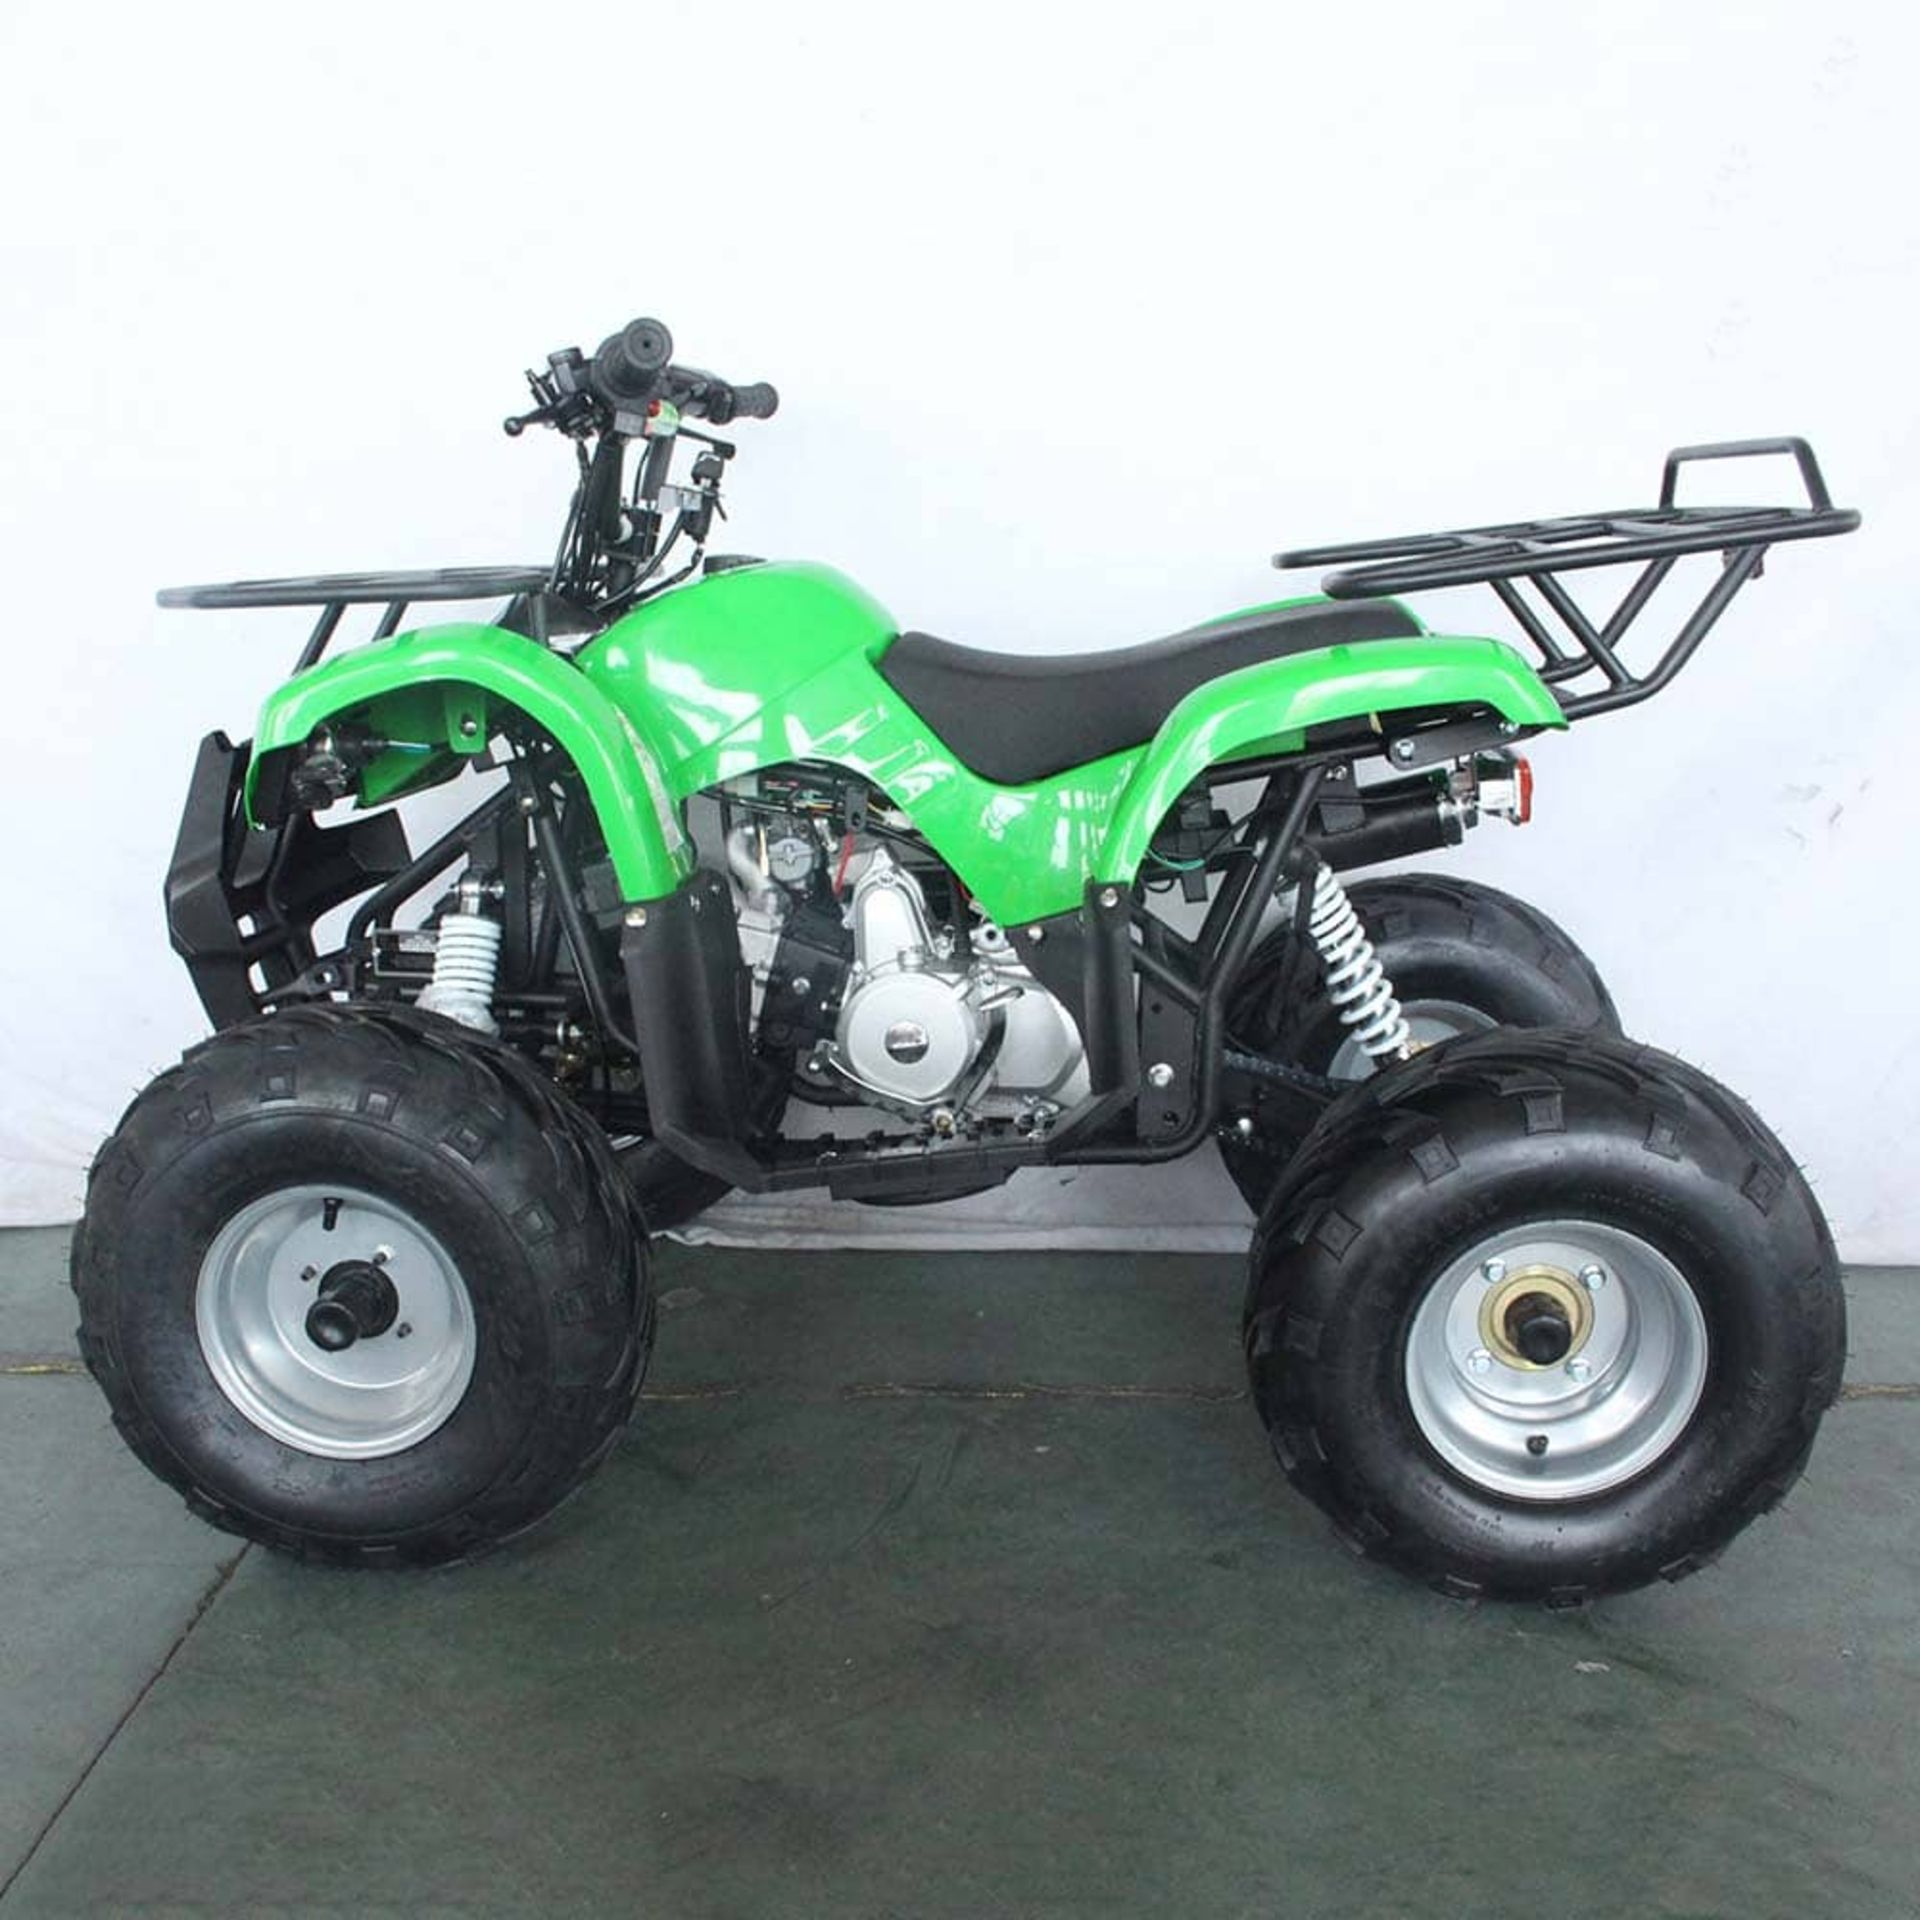 + VAT Brand New 125cc Condor Quad Bike - Four Stroke - Single Cylinder - Front Drum Brakes & Rear - Image 3 of 9